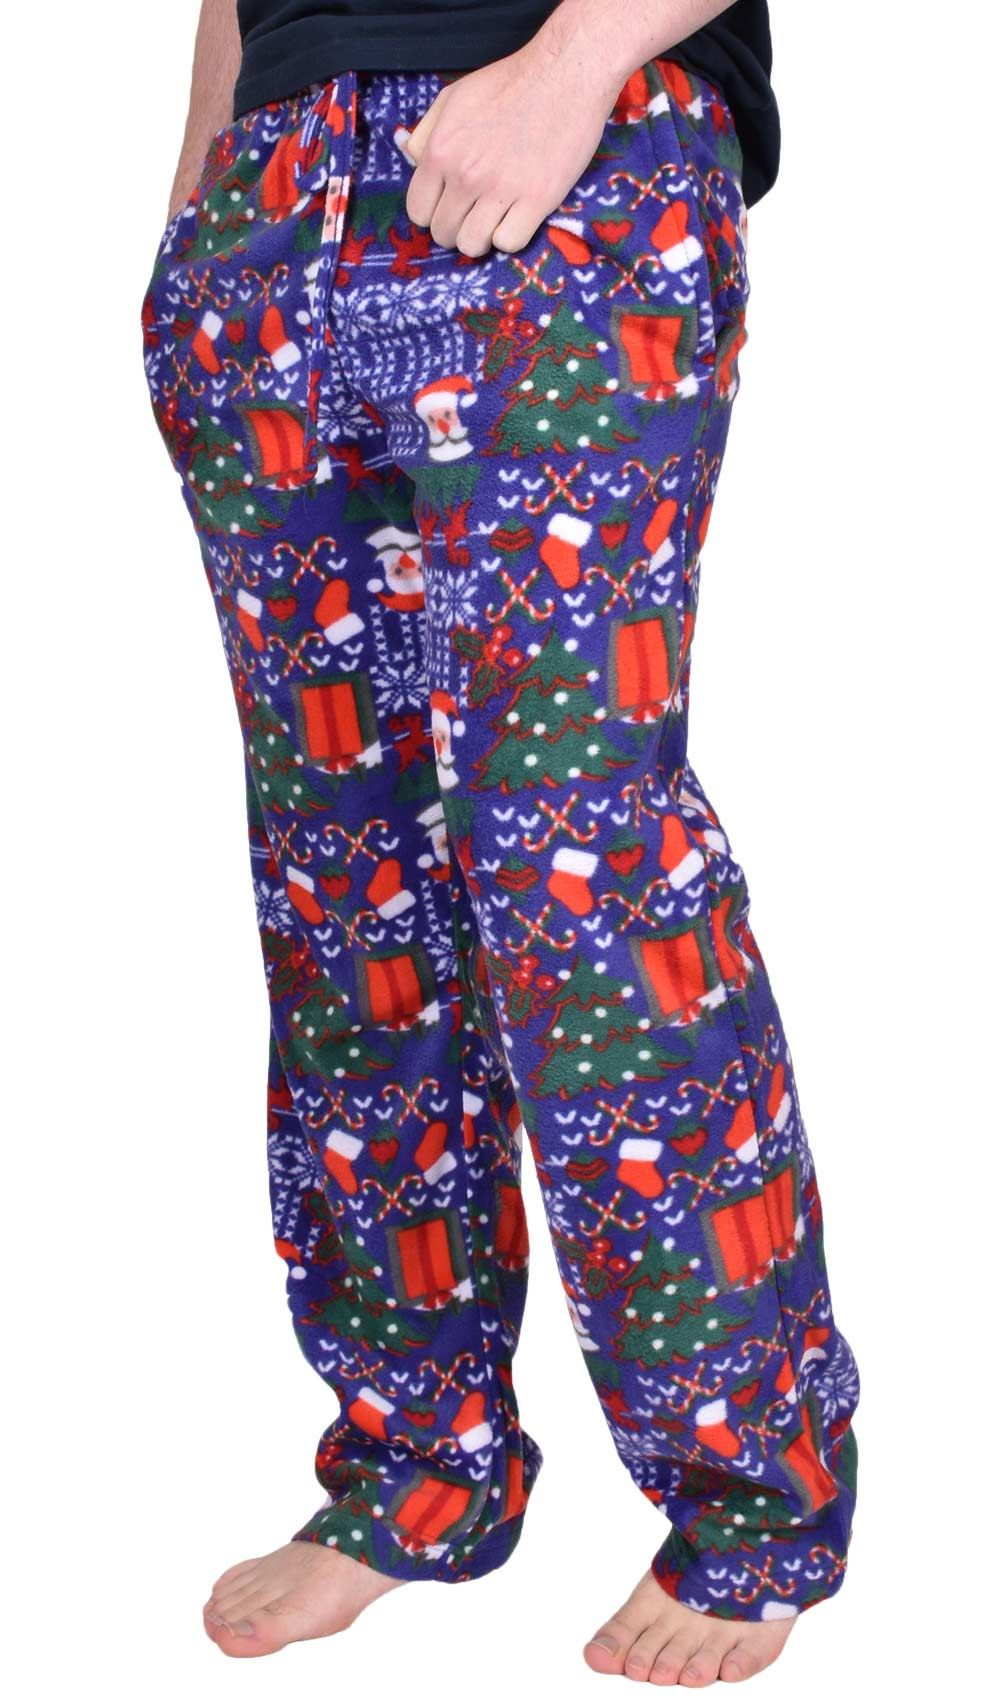 Mens-Women-Plain-Fleece-Joggers-Bottoms-Jogging-Pant-Gym-Fitness-Sports-Trousers thumbnail 22